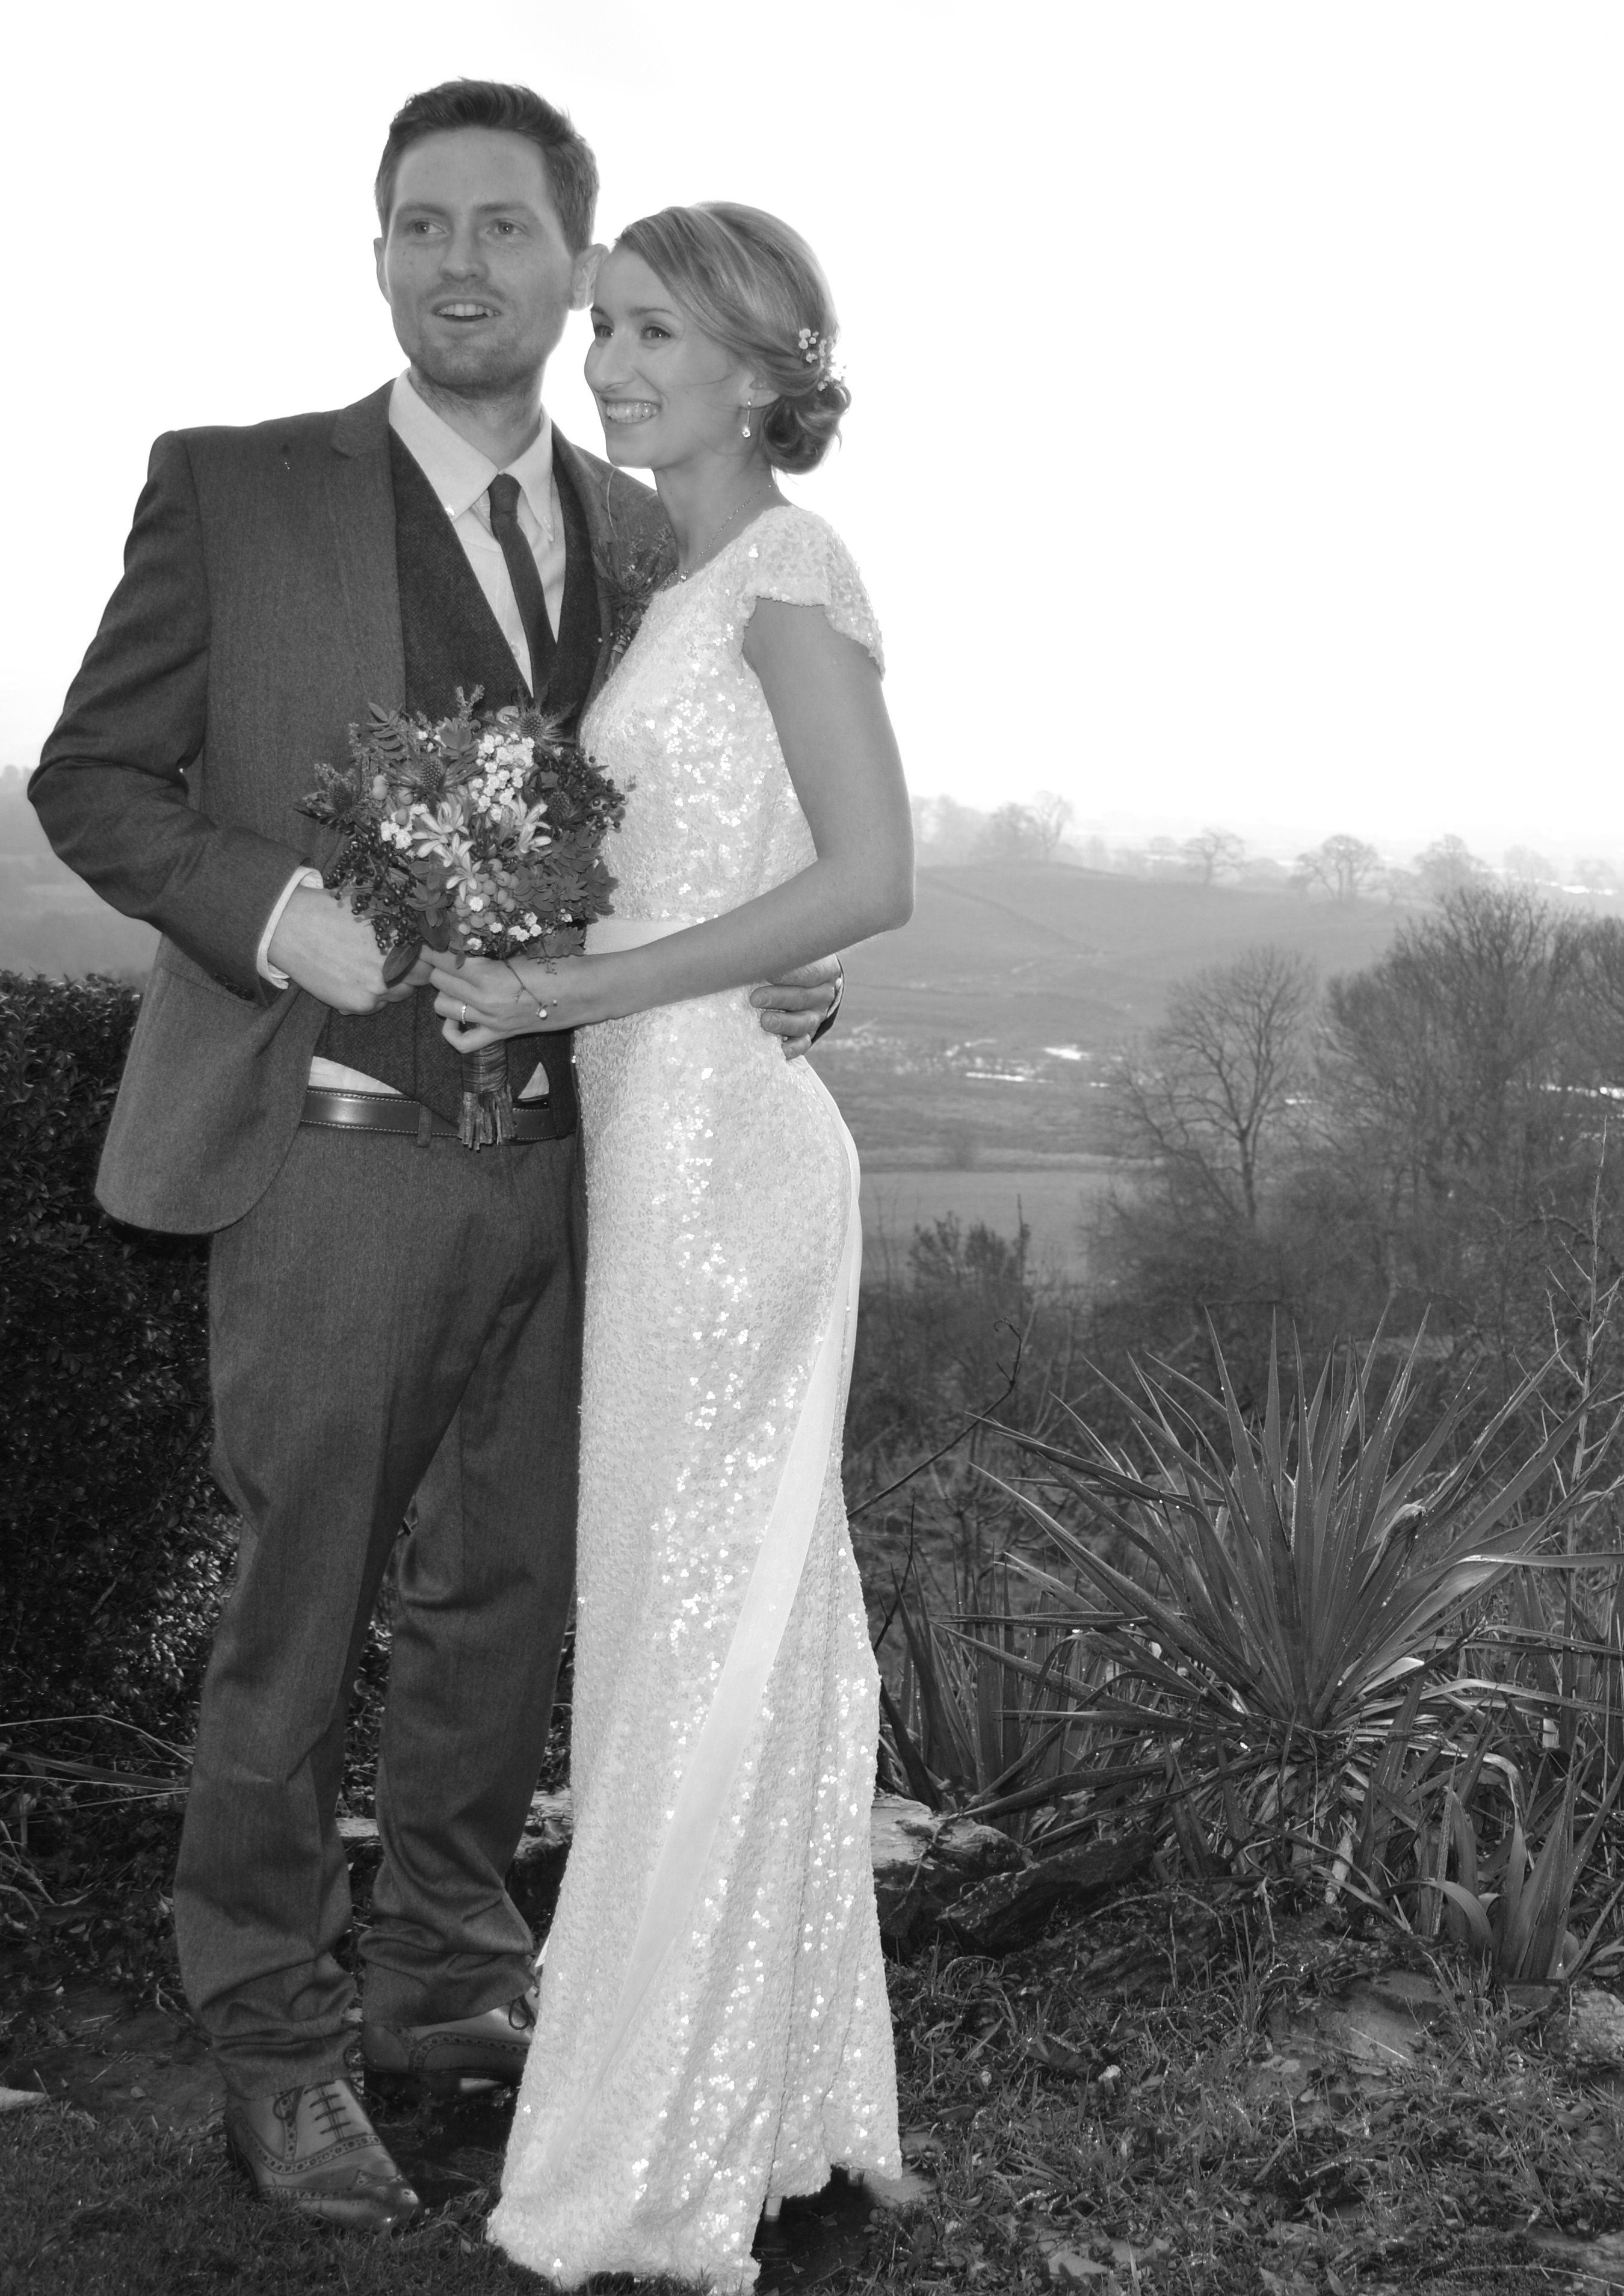 Wedding dress suit  Tweed suit Backless sequin wedding dress  Dream Day  Pinterest